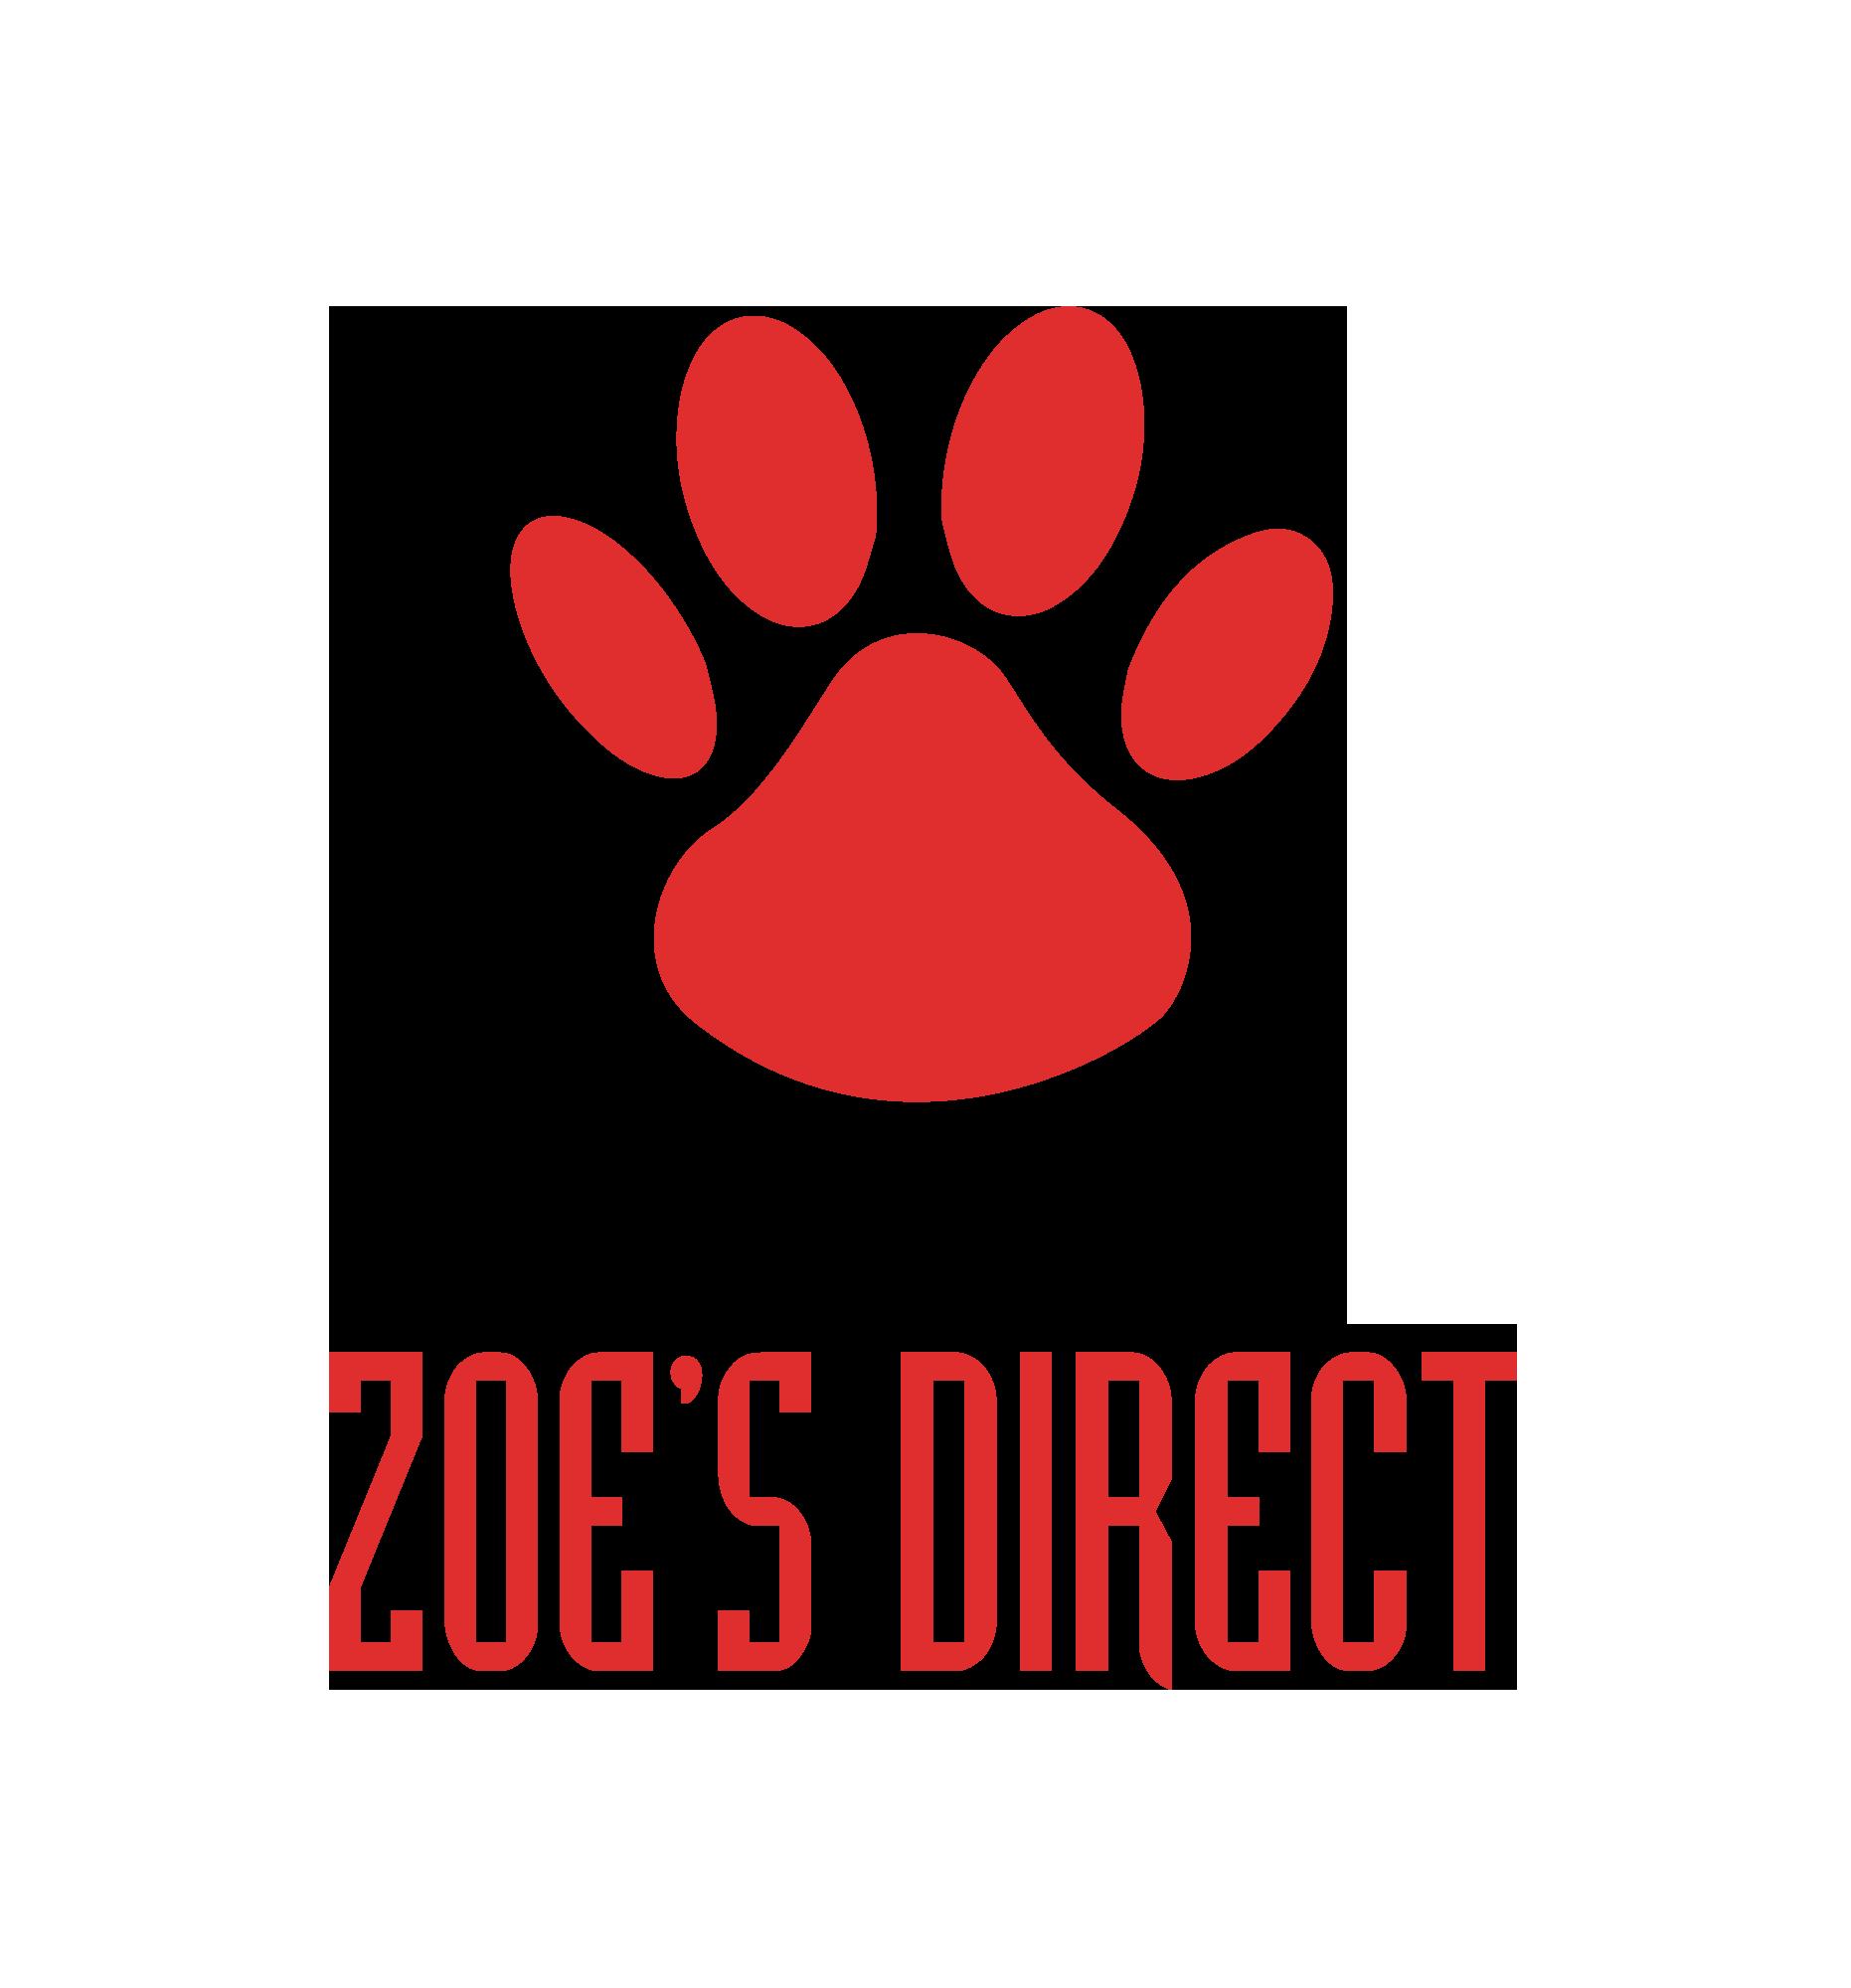 zoesdirect_logo